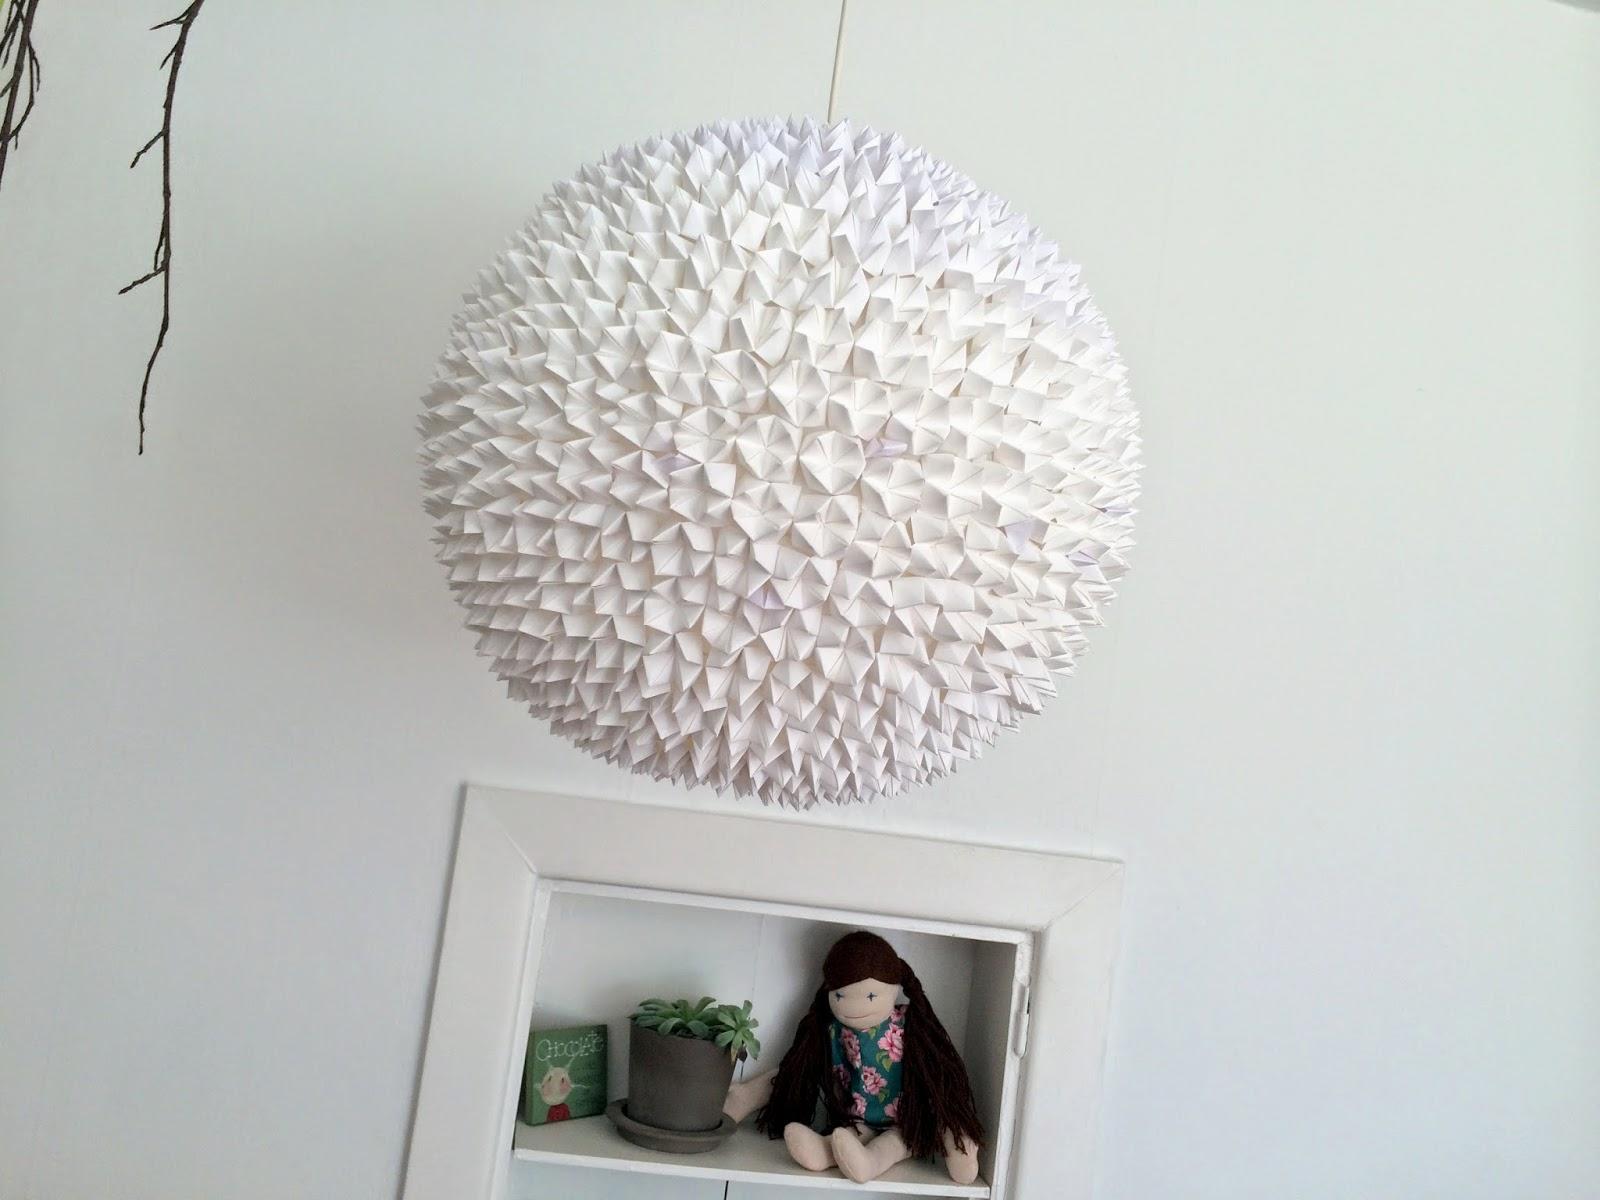 Søndergaard & co: diy origami lampe // diy origami lamp